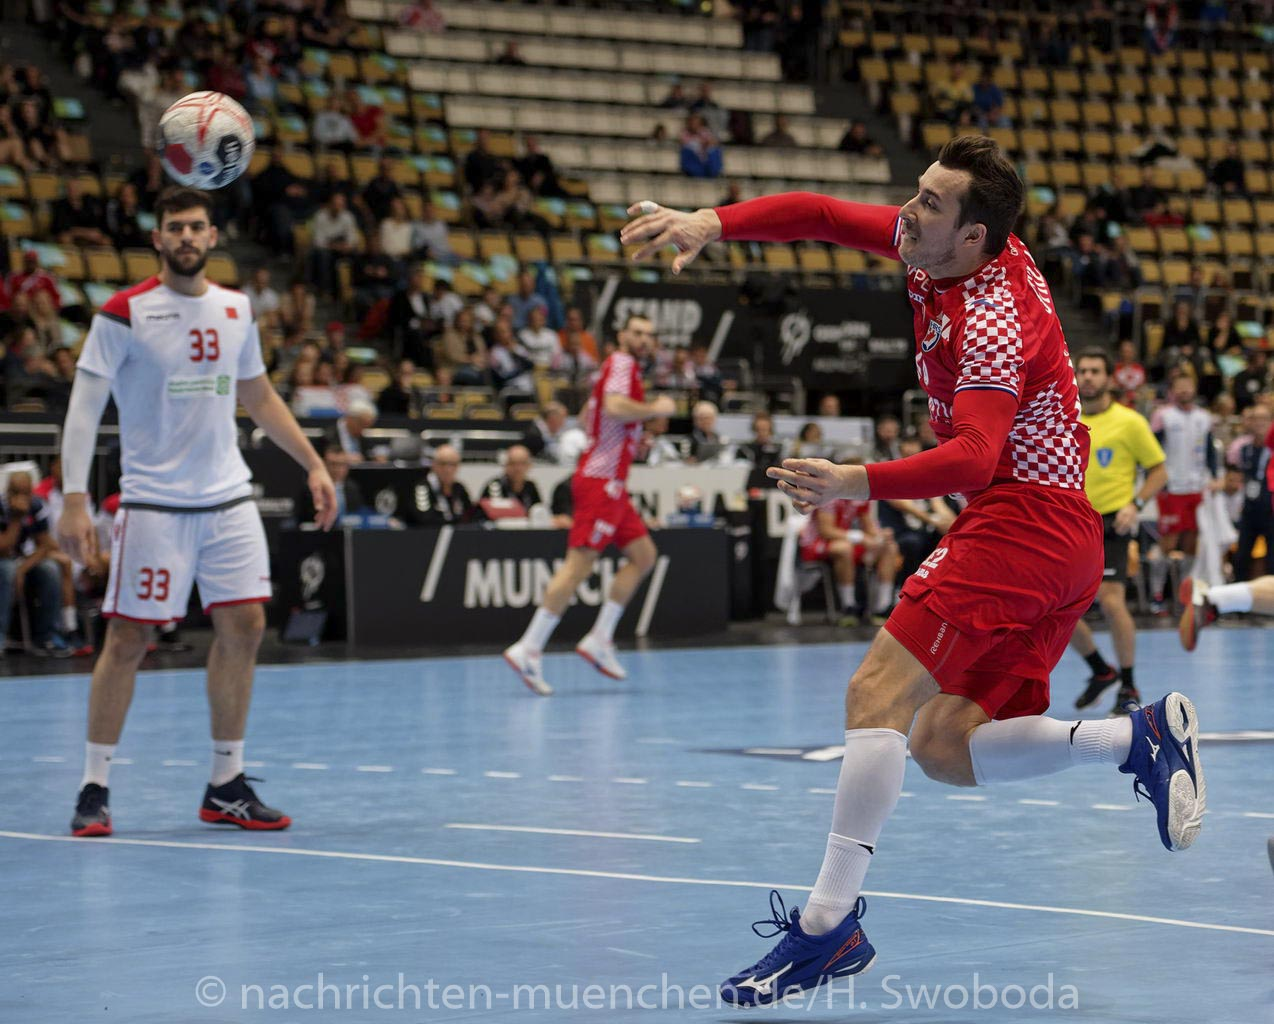 Handball wm 2020 tickets munchen